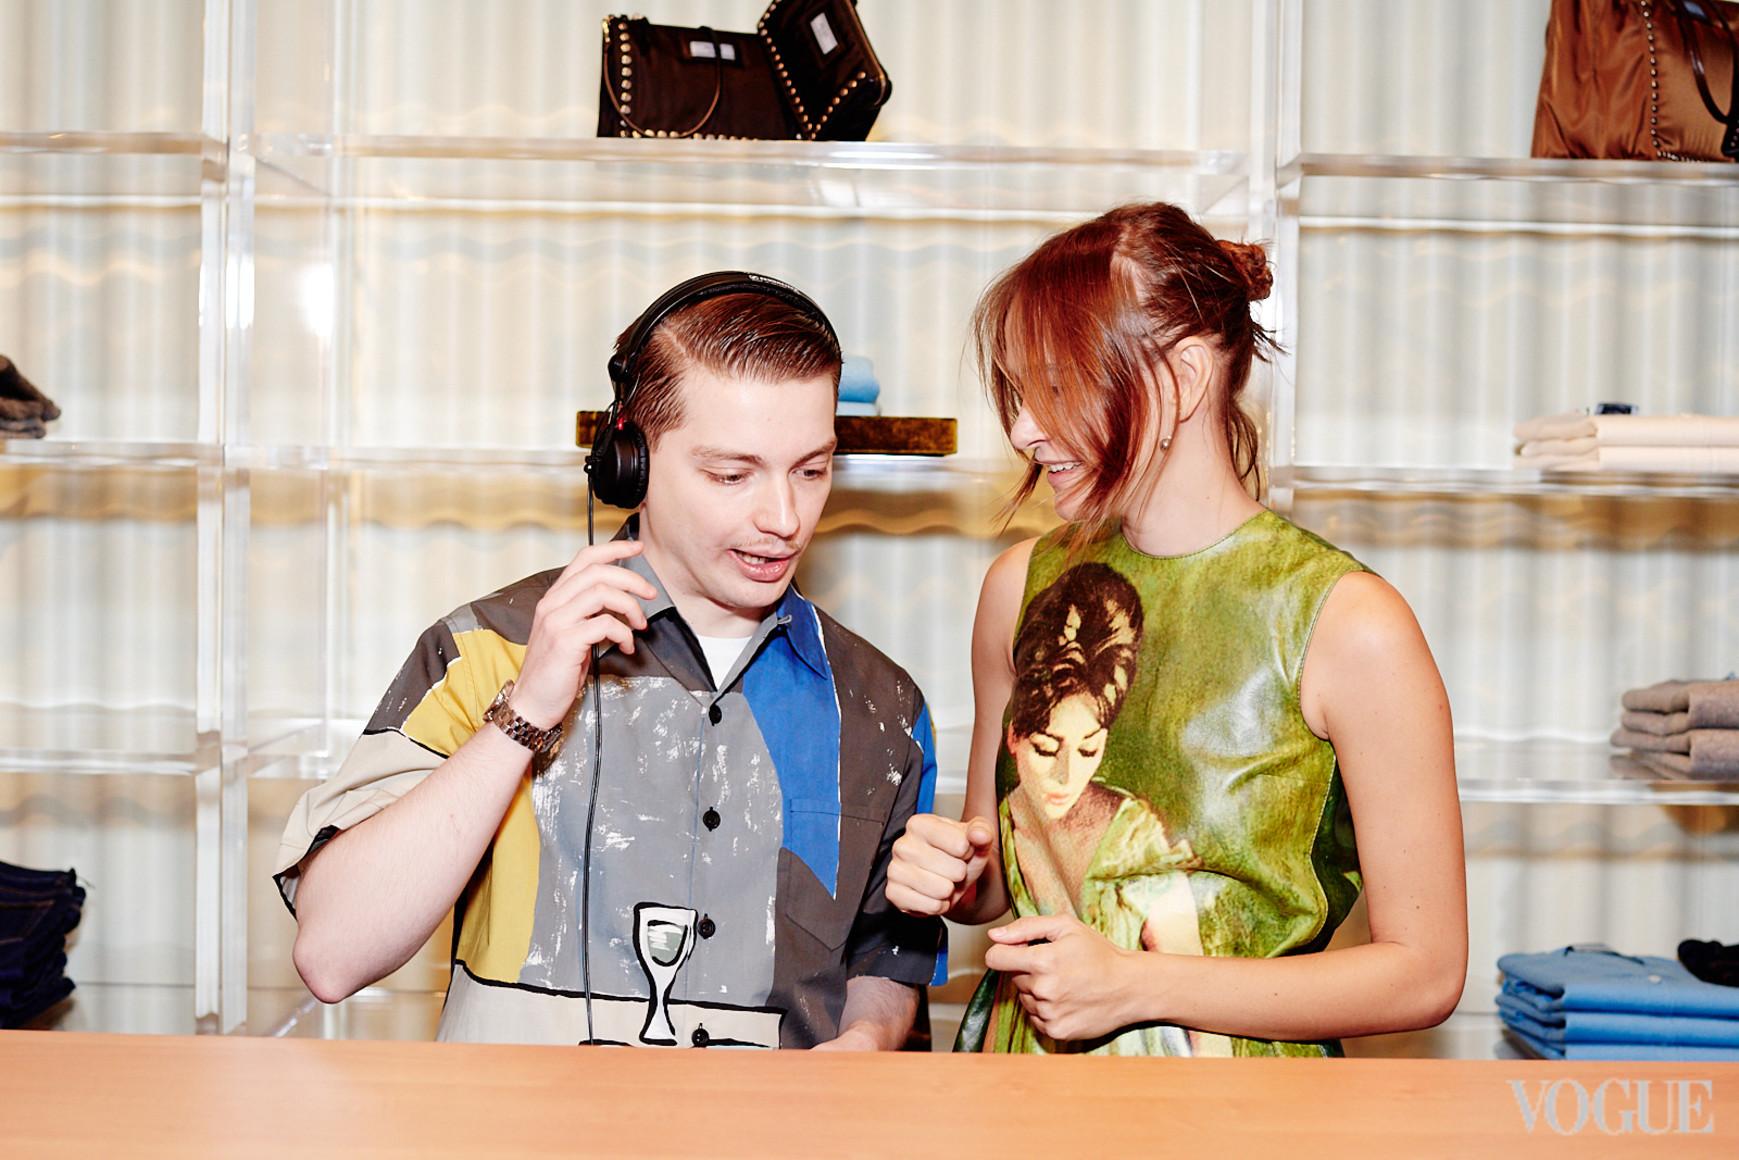 Филипп Маркович и Надя Шаповал